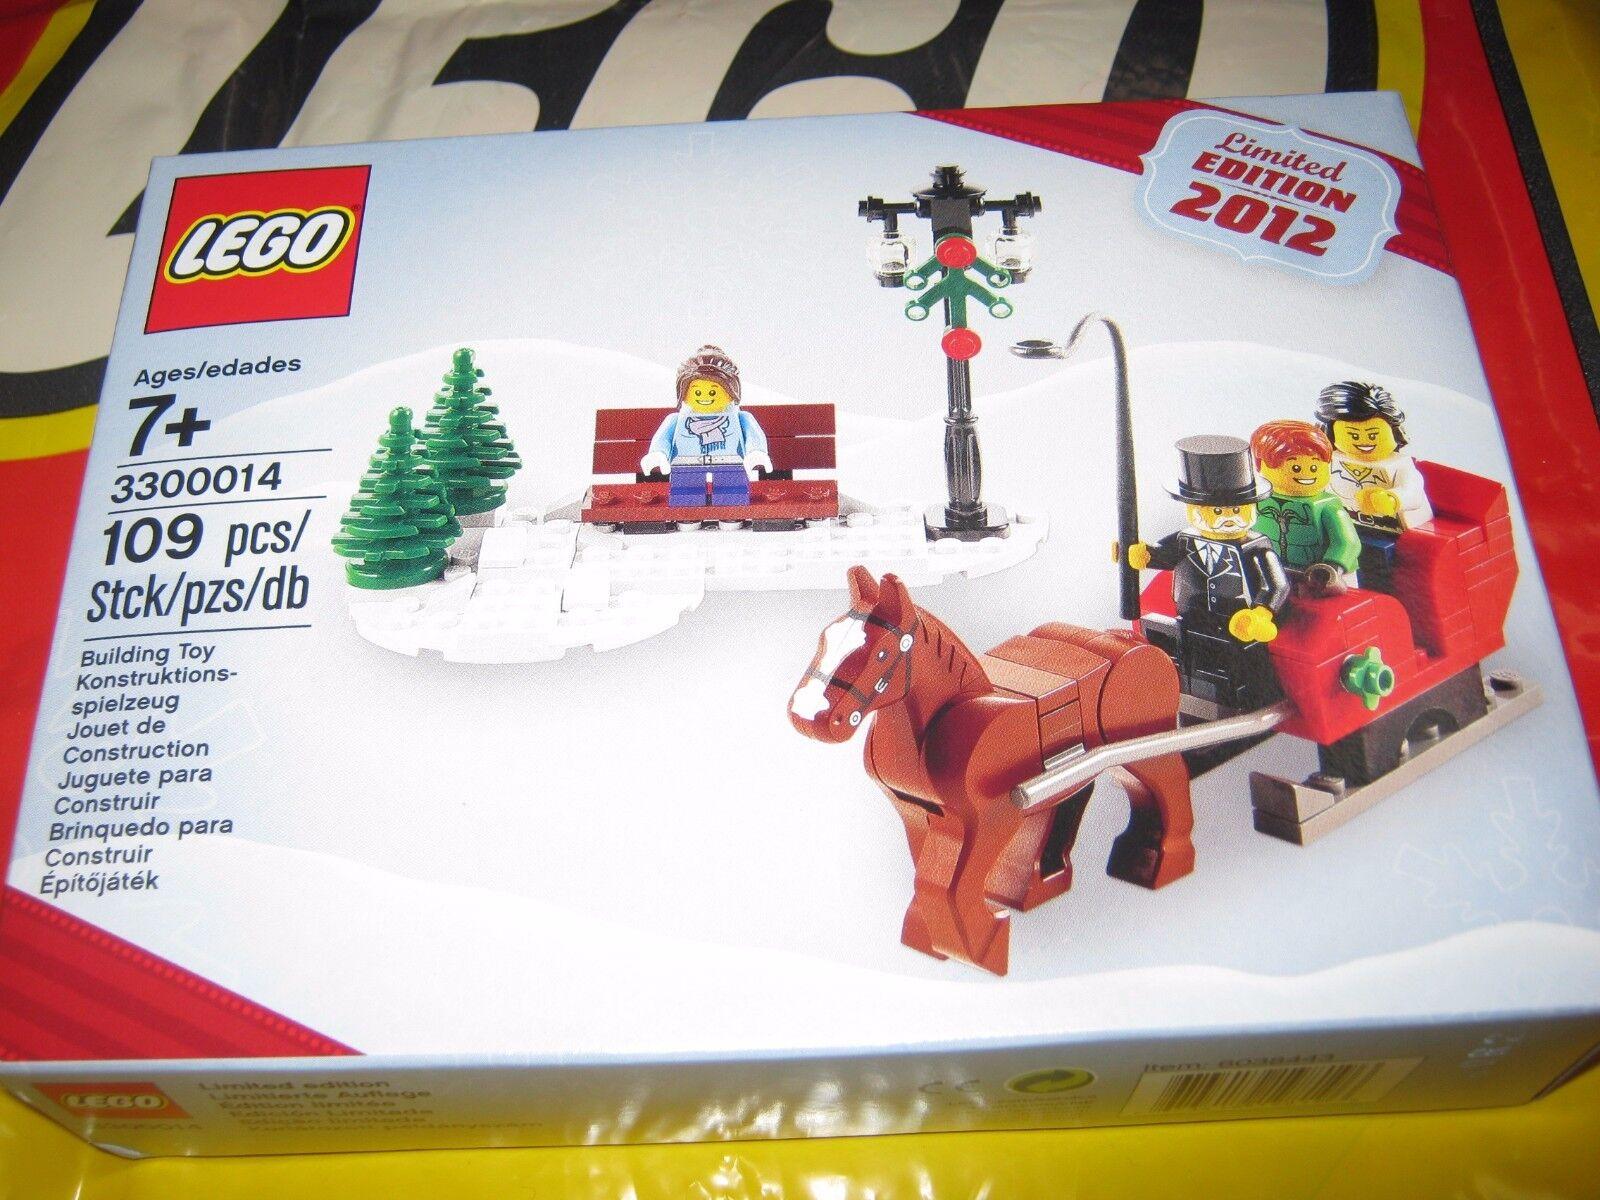 LEGO Saisonnier Noël Set 3300014 Limited Edition Exclusive 2012 RARE RARE RARE PROMO de10ed